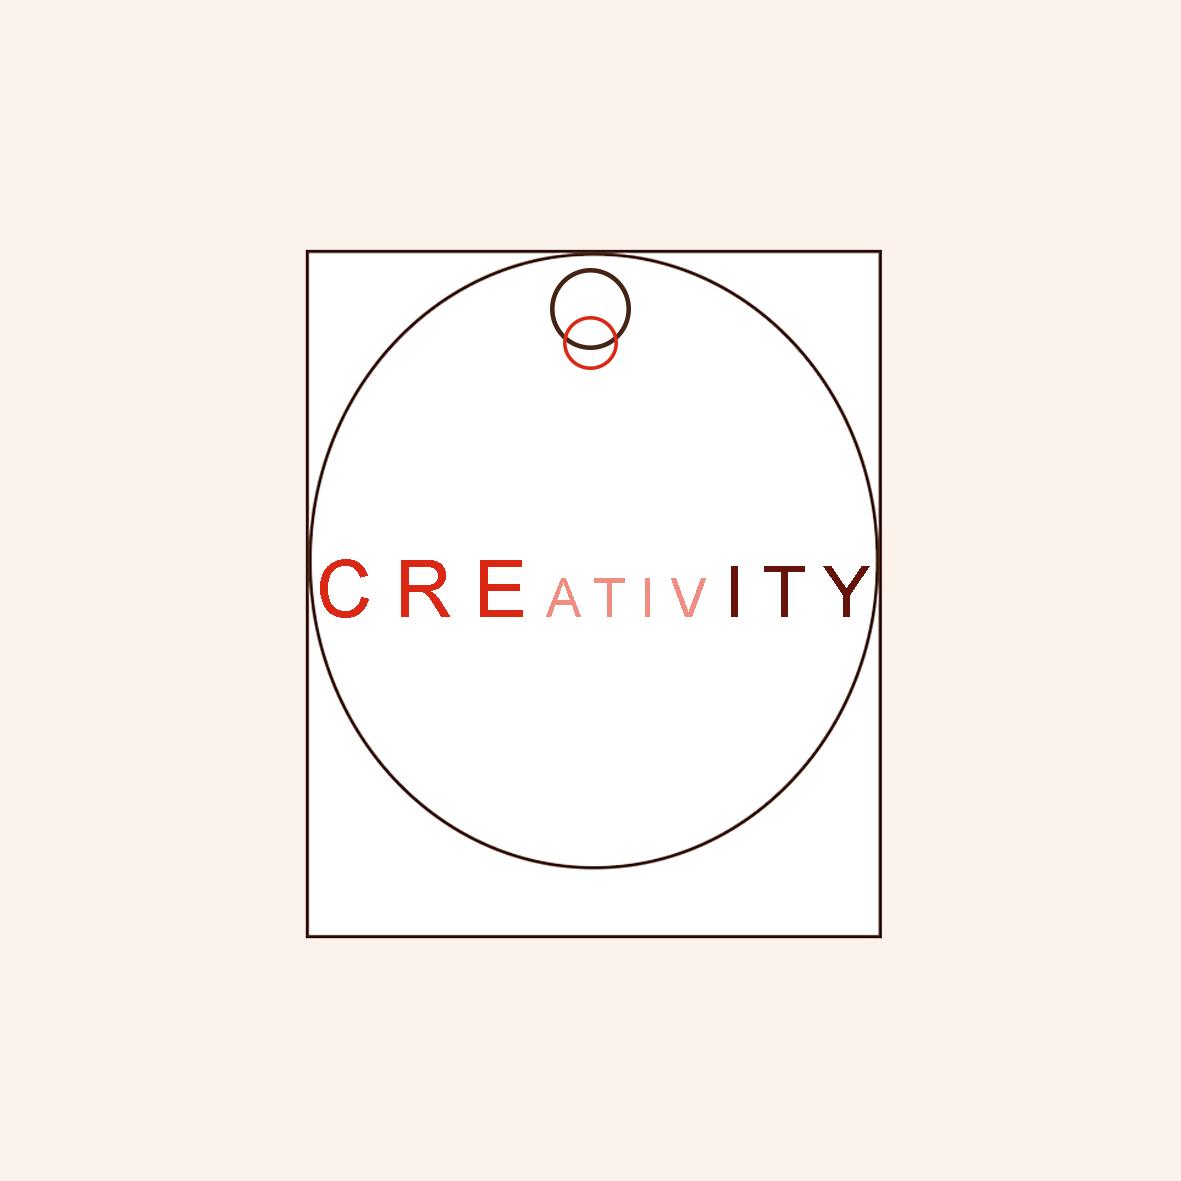 Creativity2.jpg